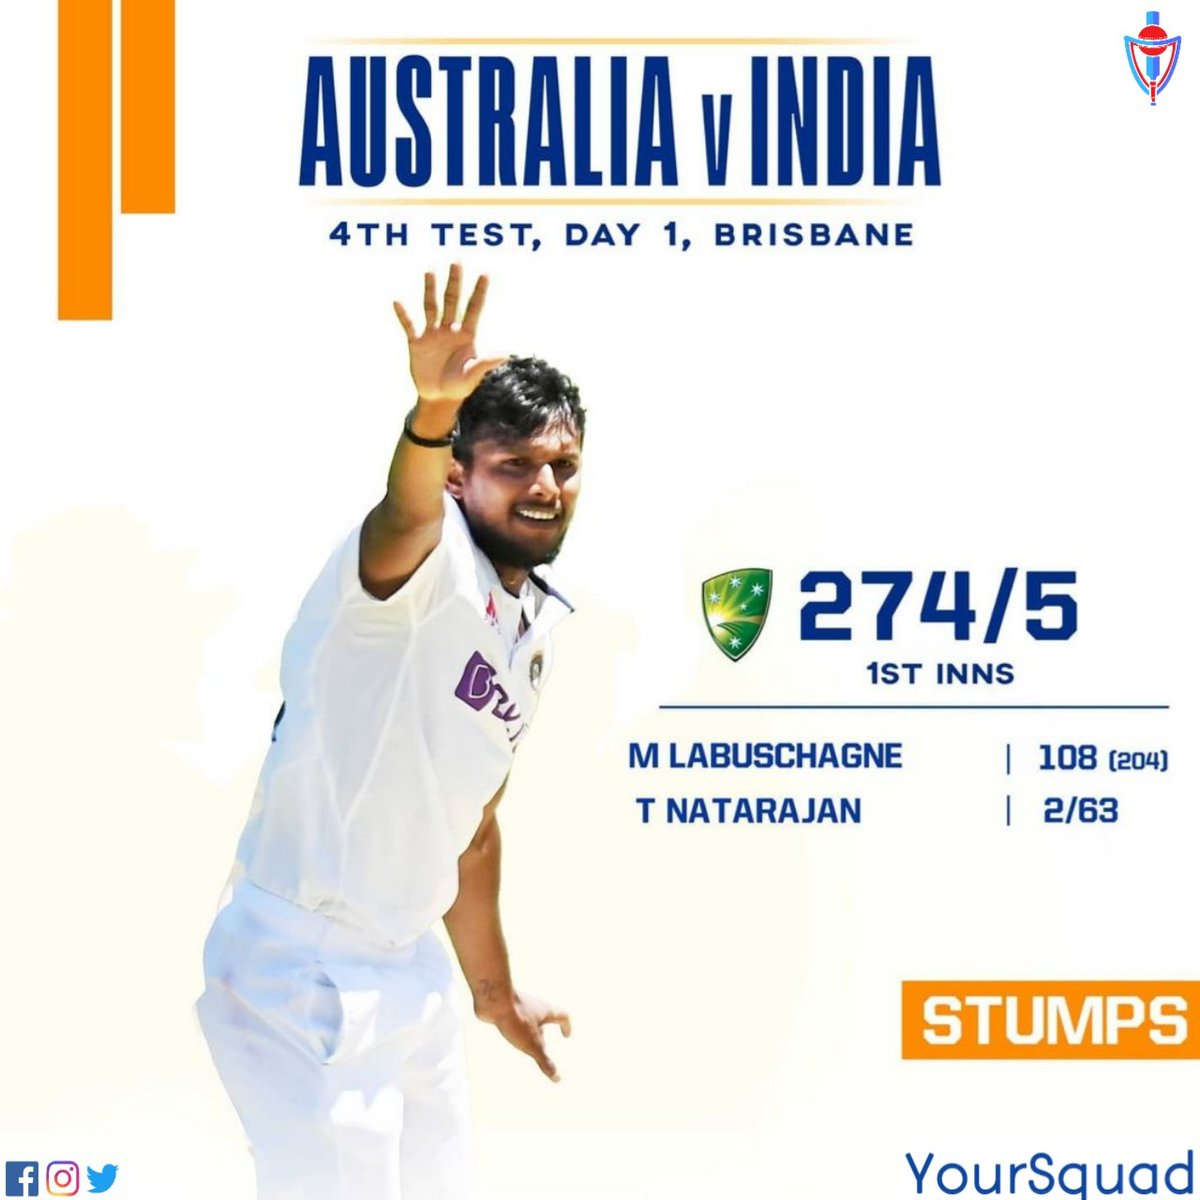 End of Day 1️⃣  #TeamIndia have picked up 5️⃣ wickets  2️⃣ for Natarajan 1️⃣ each for Siraj, Shardul & Sundar   Join us for Day 2 action Tomorrow #AUSvIND